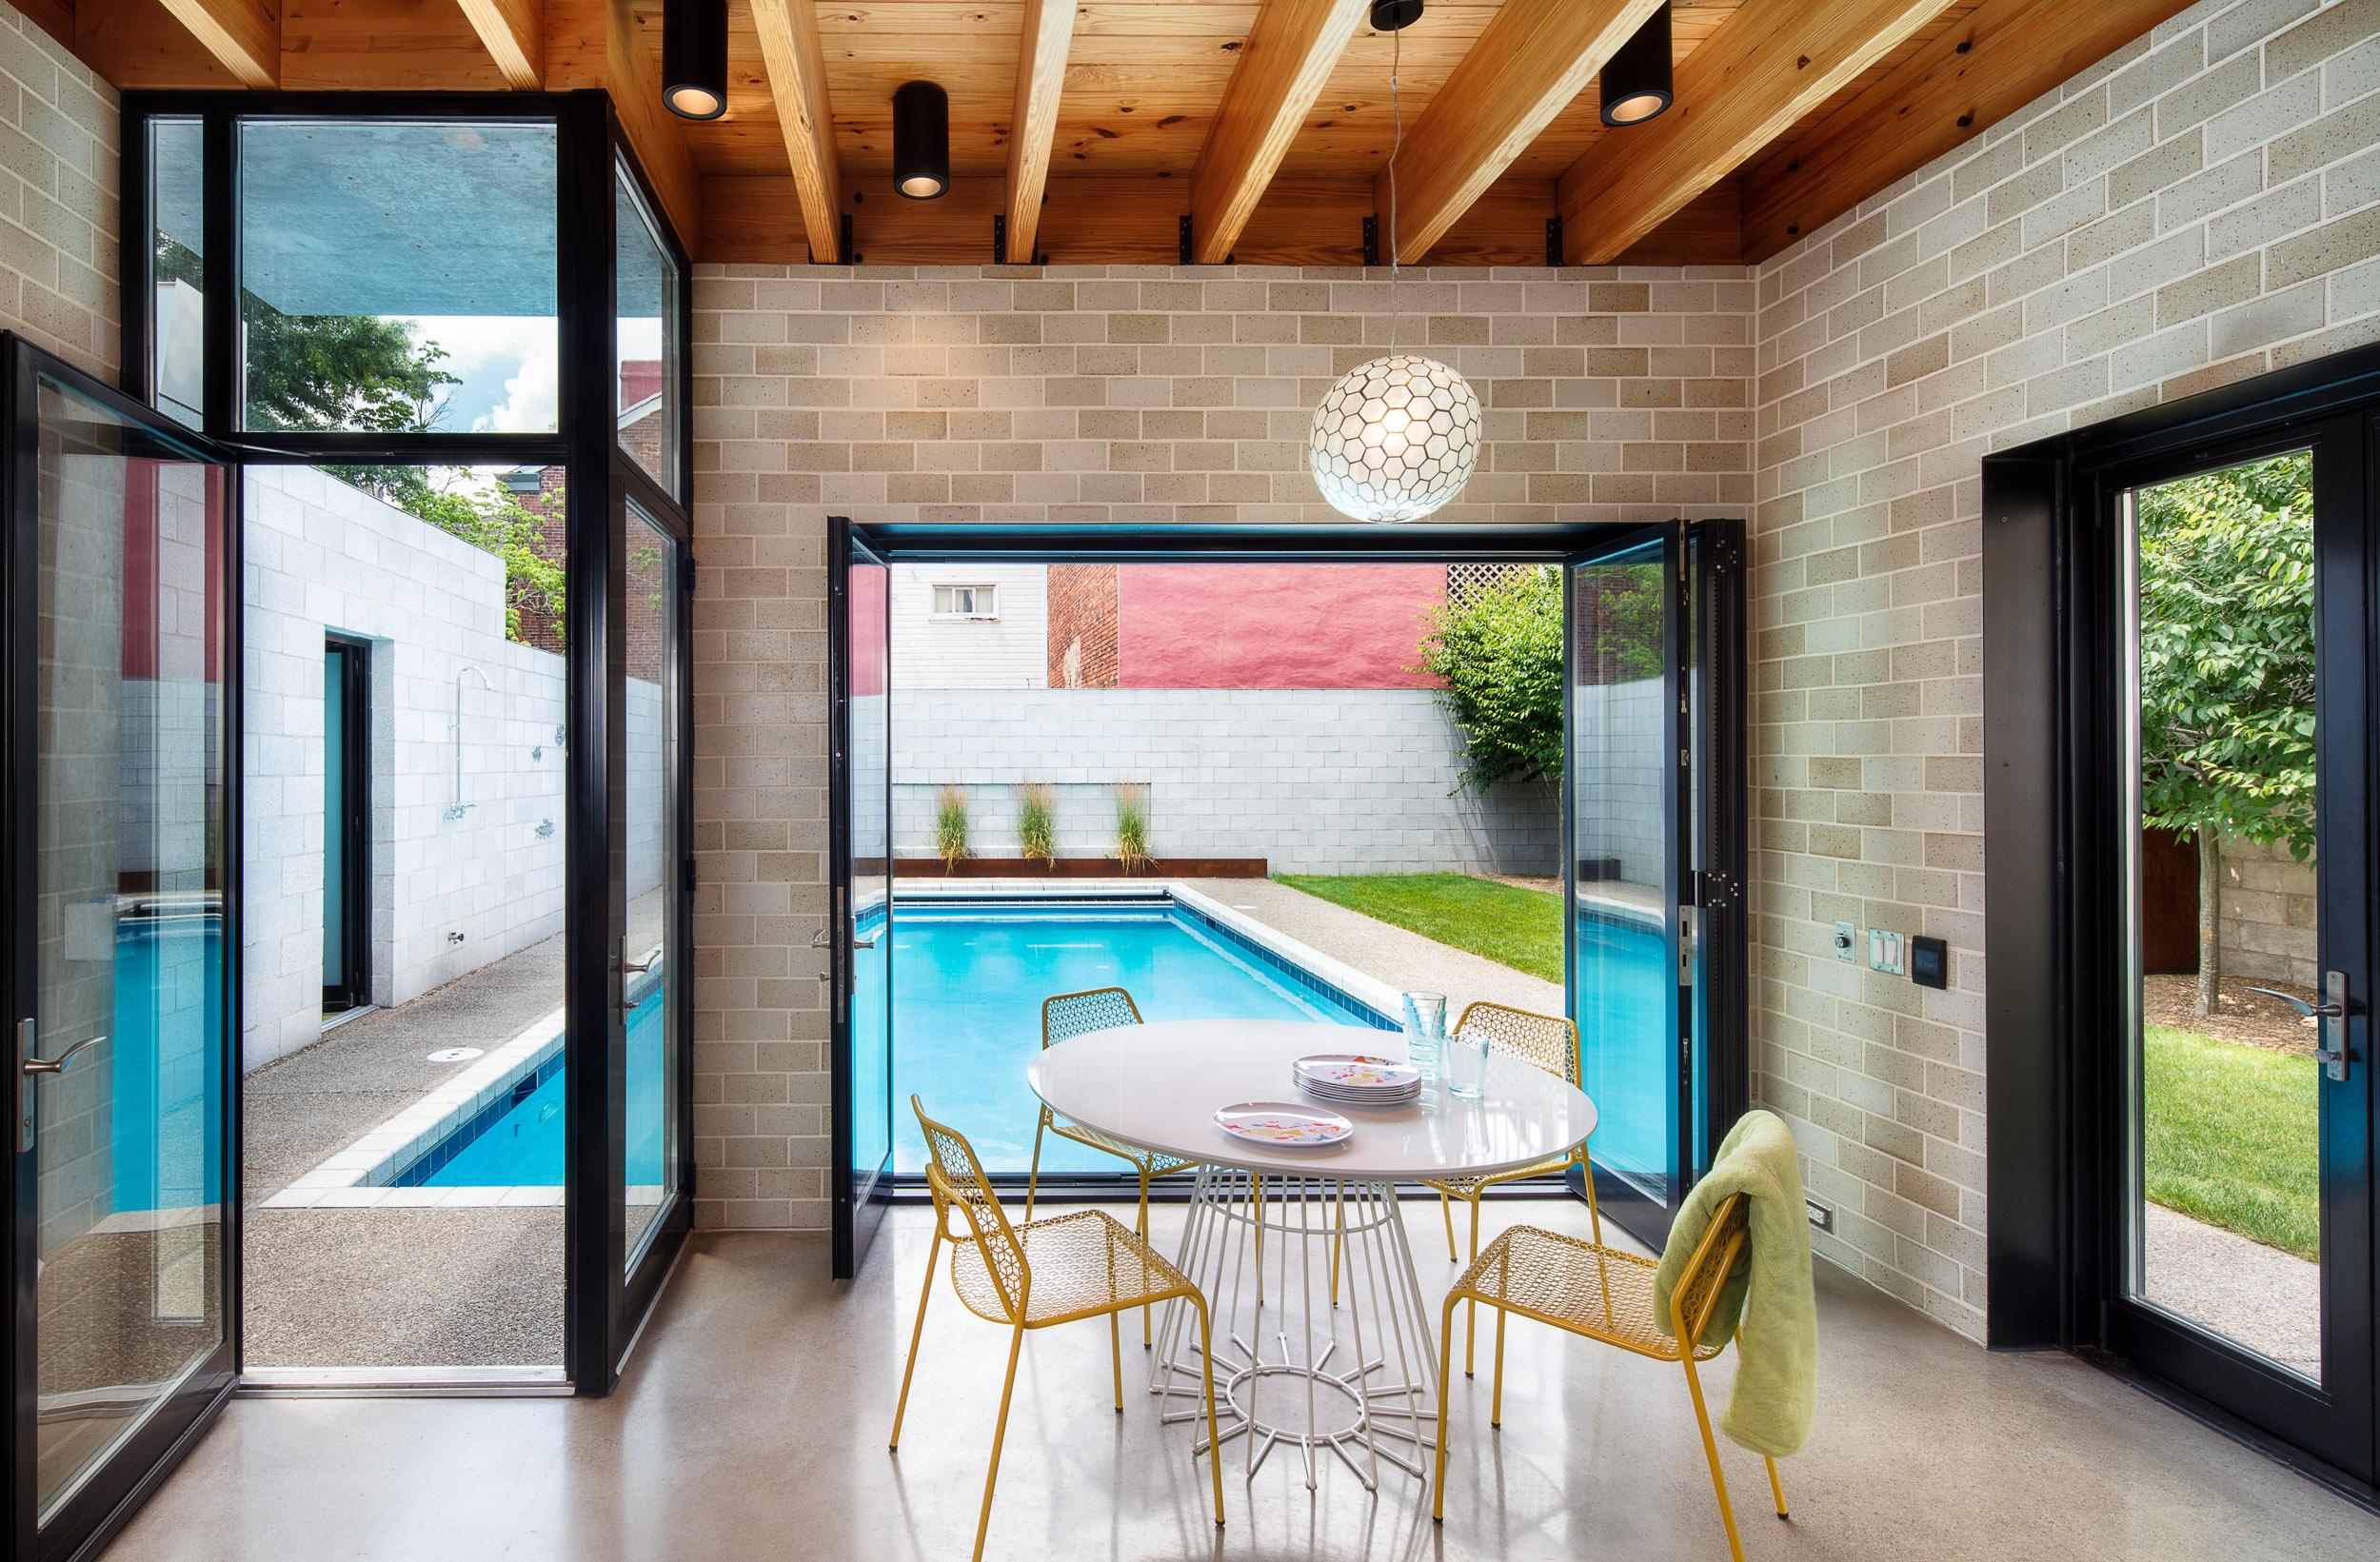 pool_pavilion_pittsburgh_design_poolhouse-6.jpg